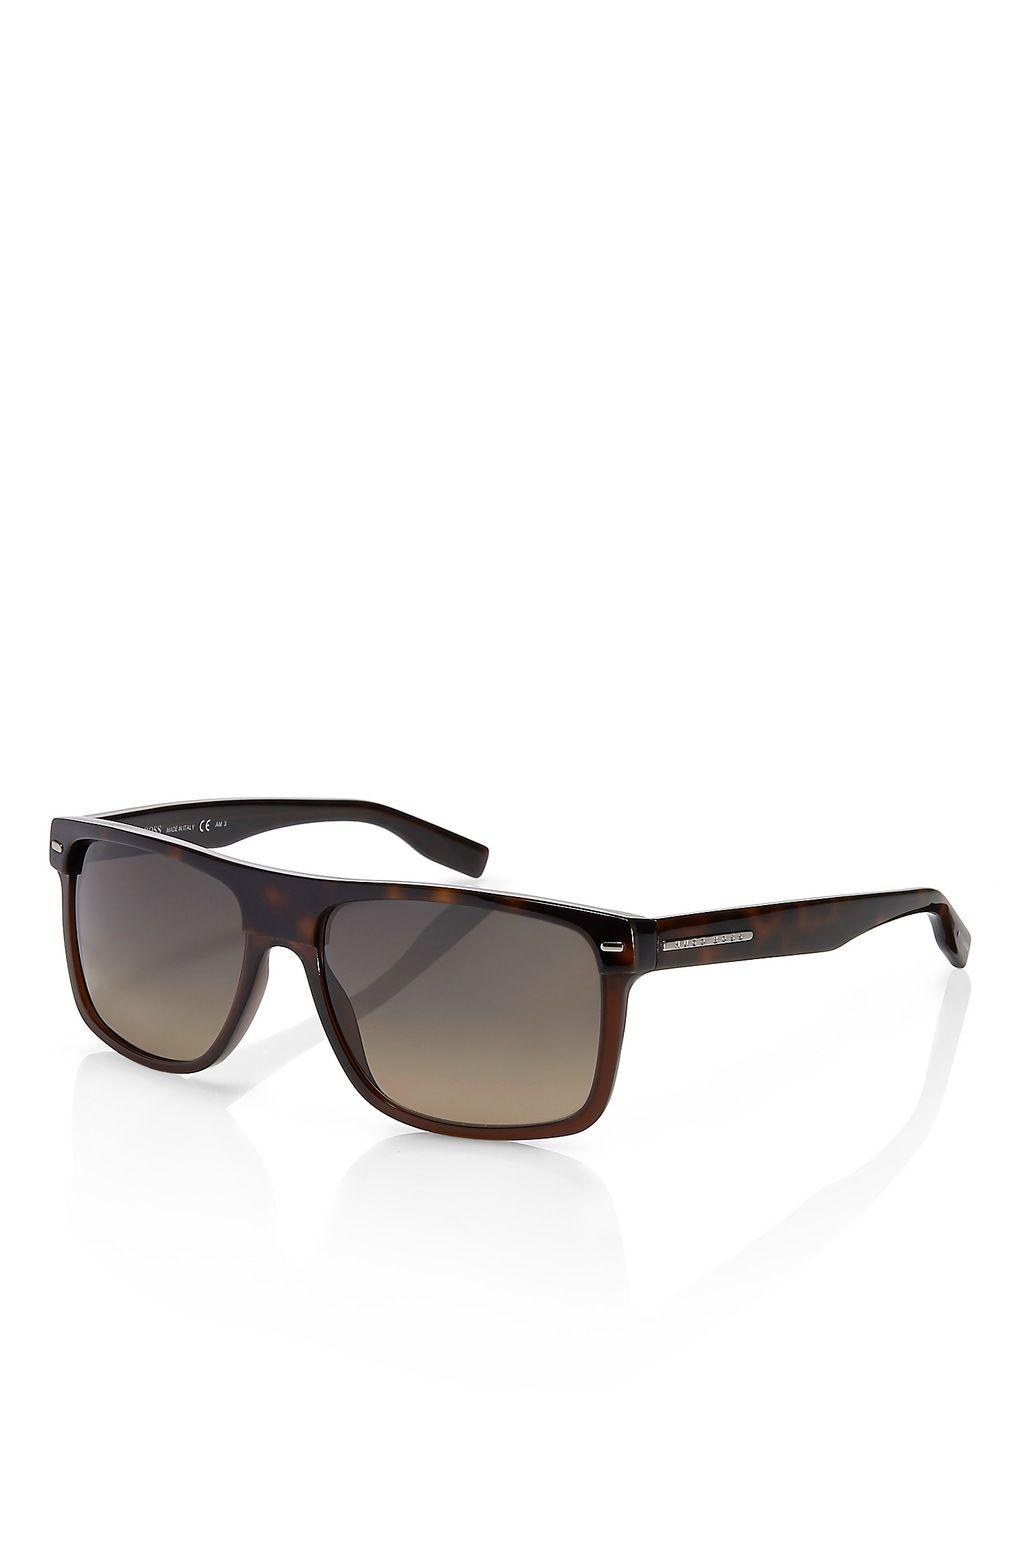 b160726d52b Hugo Boss - Men s Sunglasses http   calgaryeyecare.com index.php